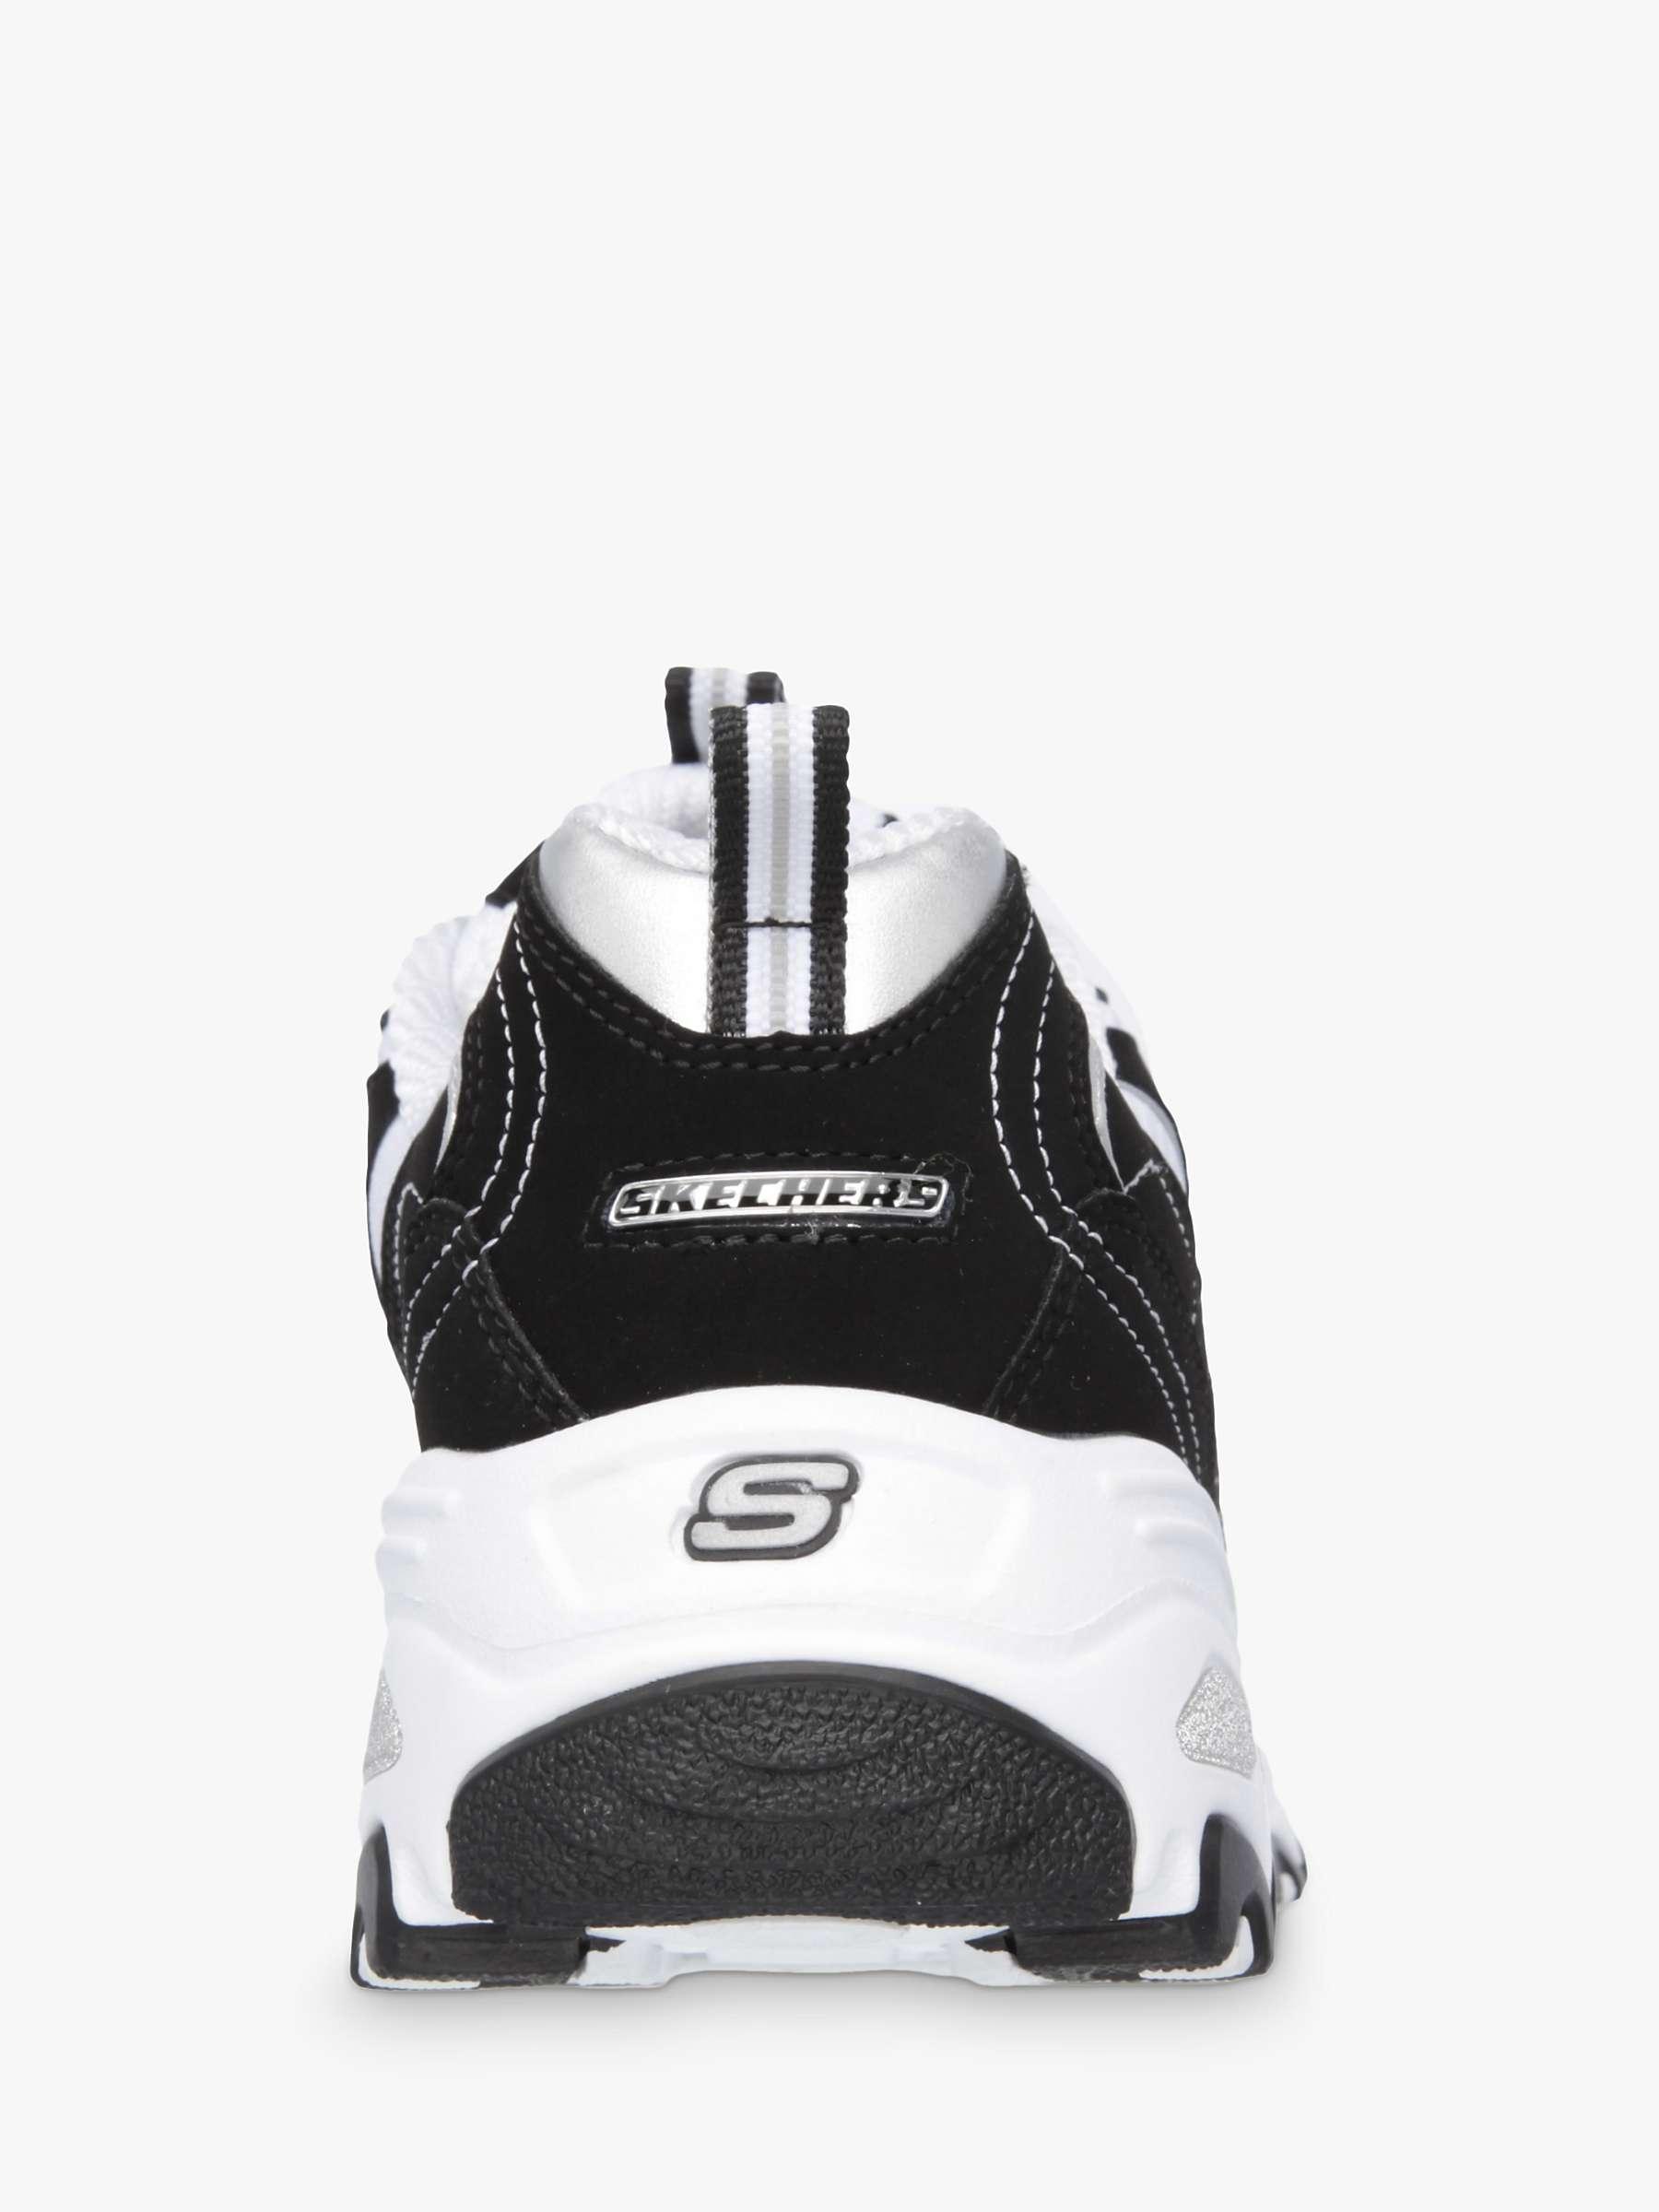 Skechers D Lites Trainers Black White Black White At